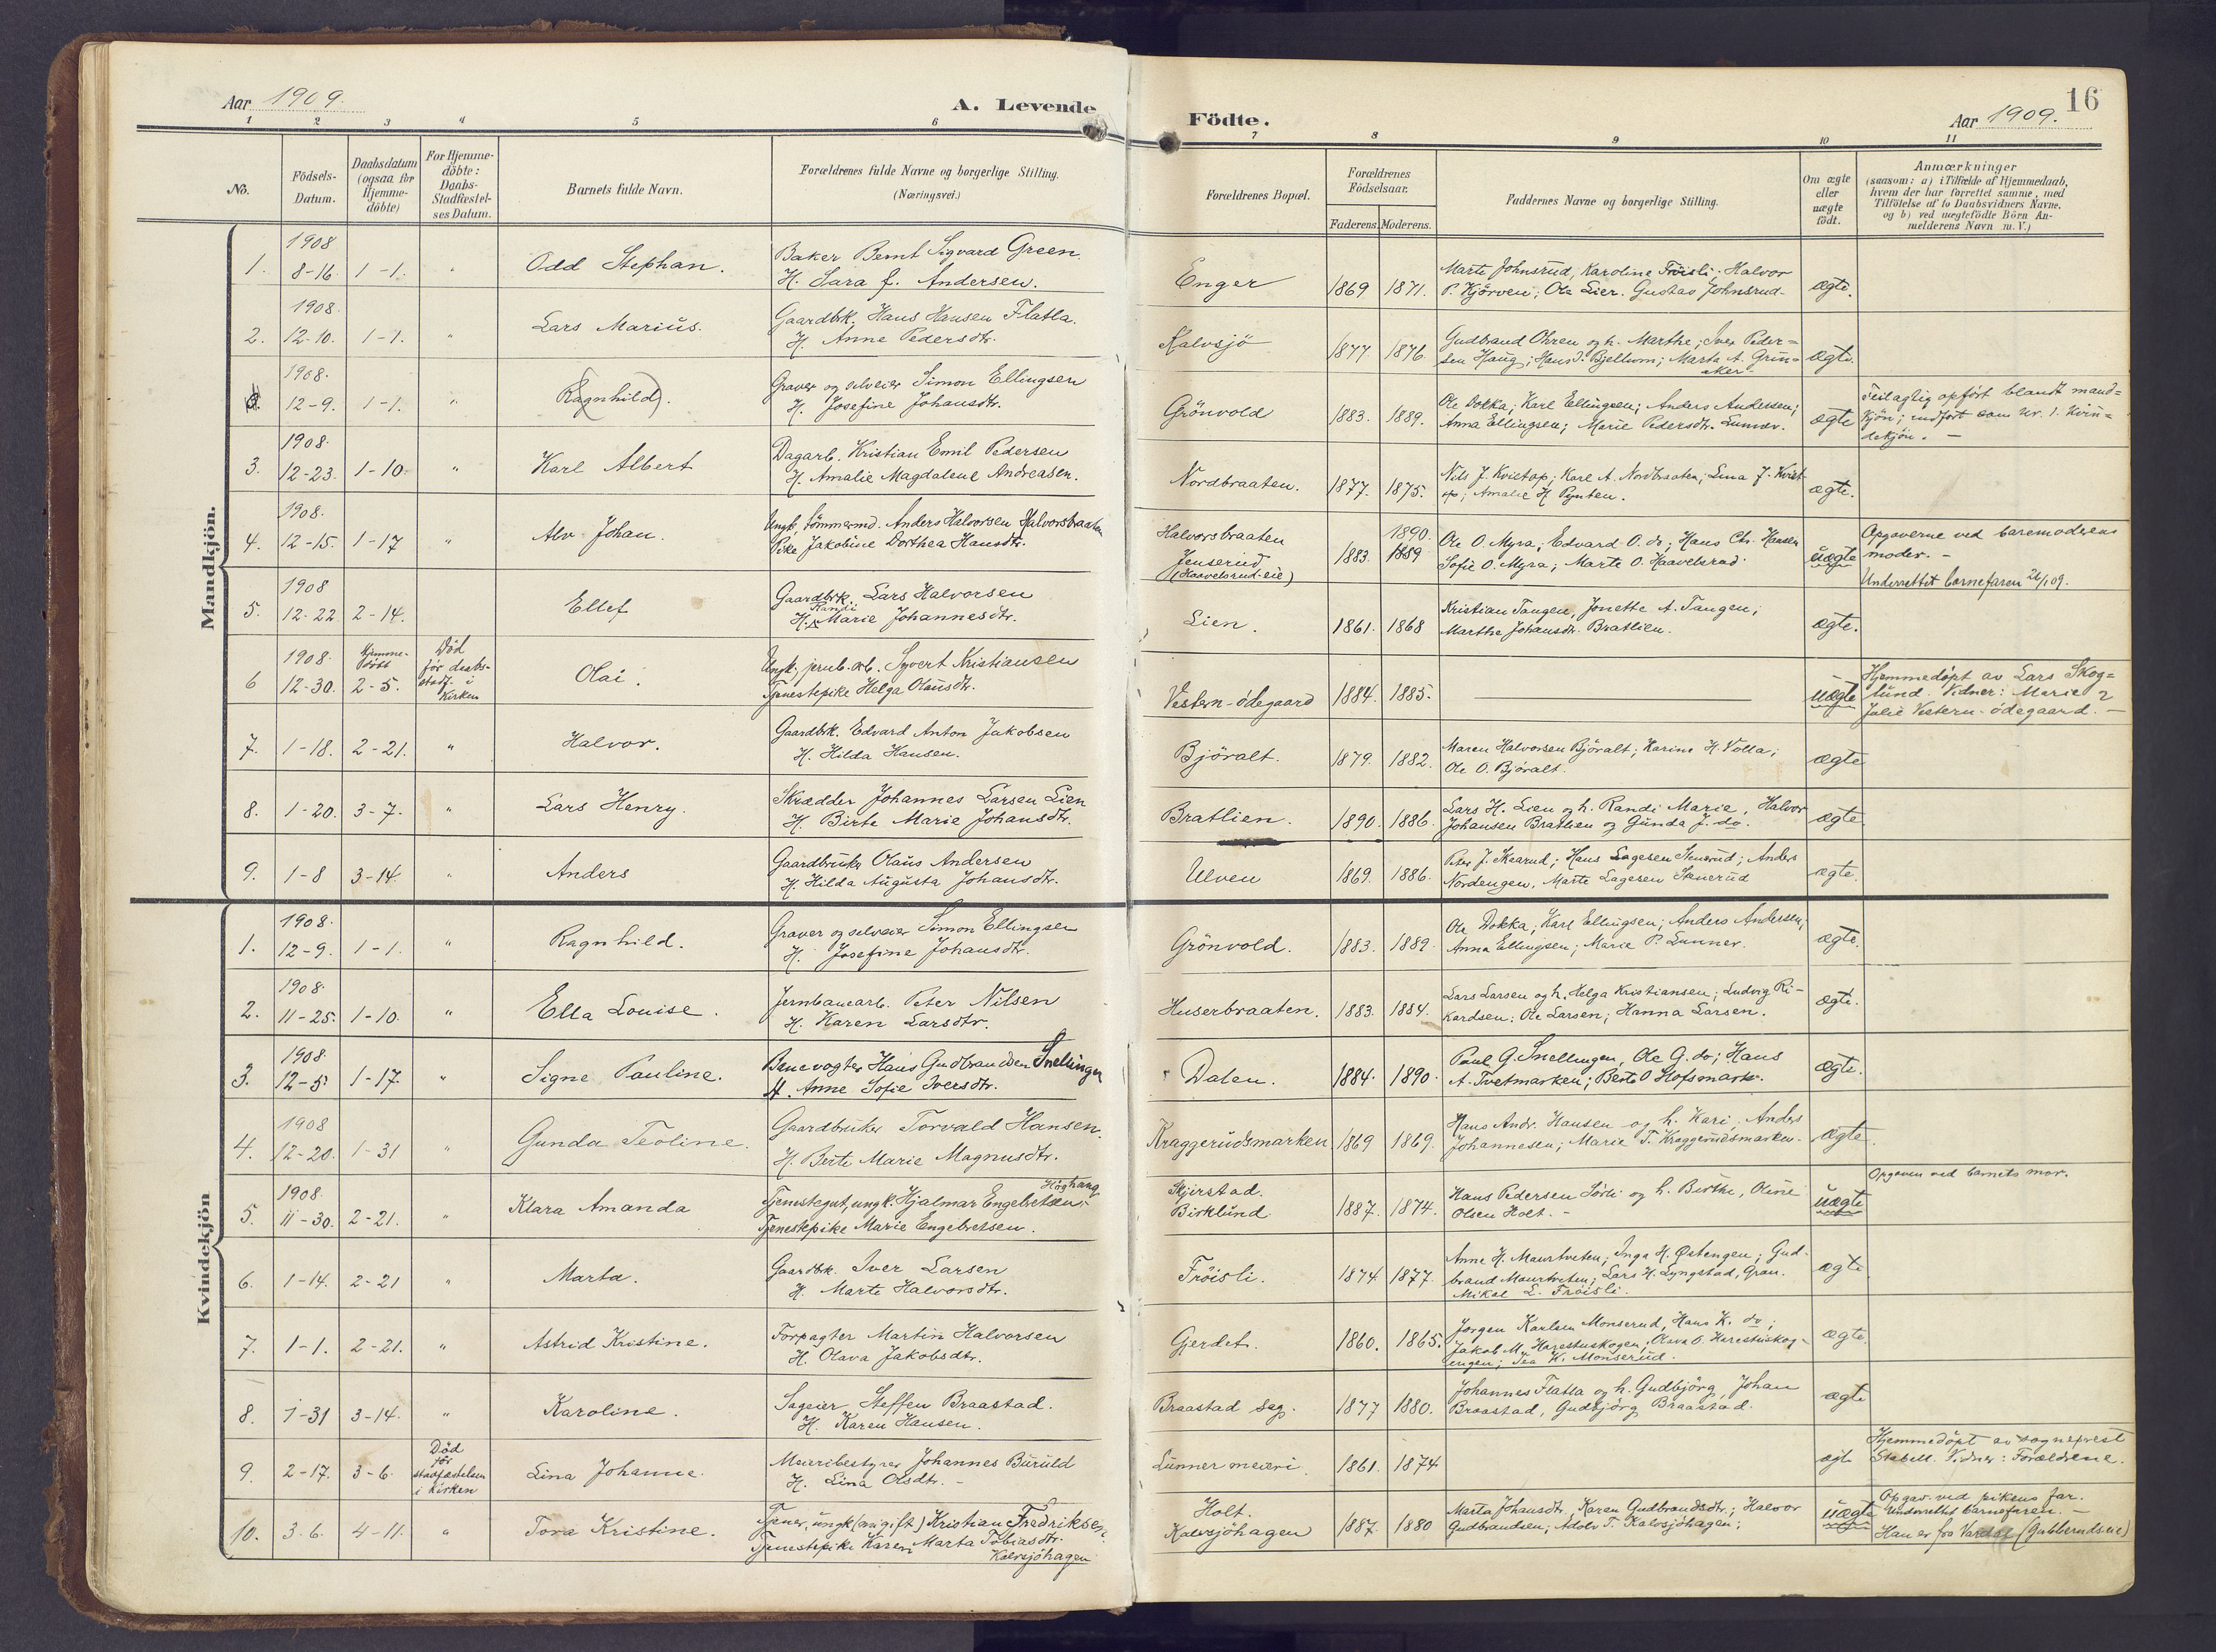 SAH, Lunner prestekontor, H/Ha/Haa/L0001: Ministerialbok nr. 1, 1907-1922, s. 16